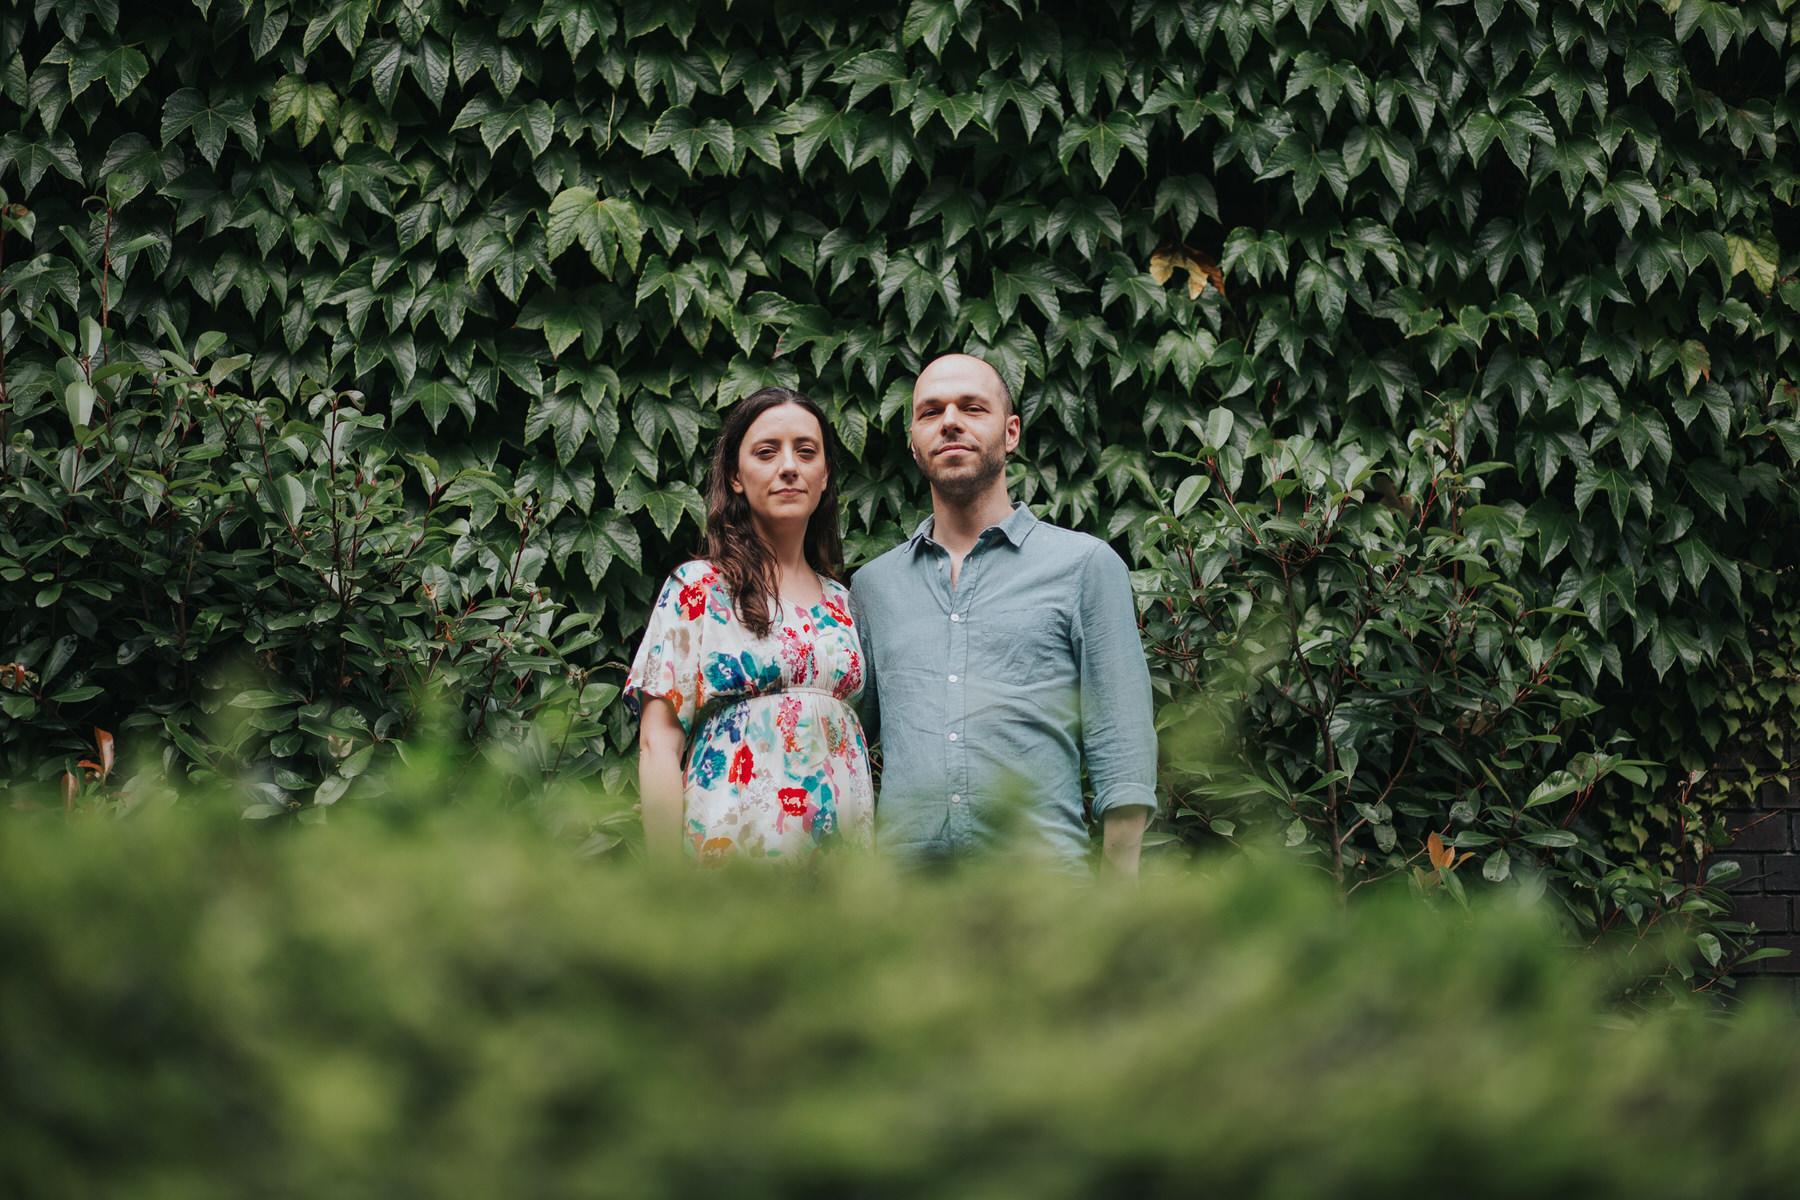 41-couple ivy wall background alternative portraits London Southbank.jpg